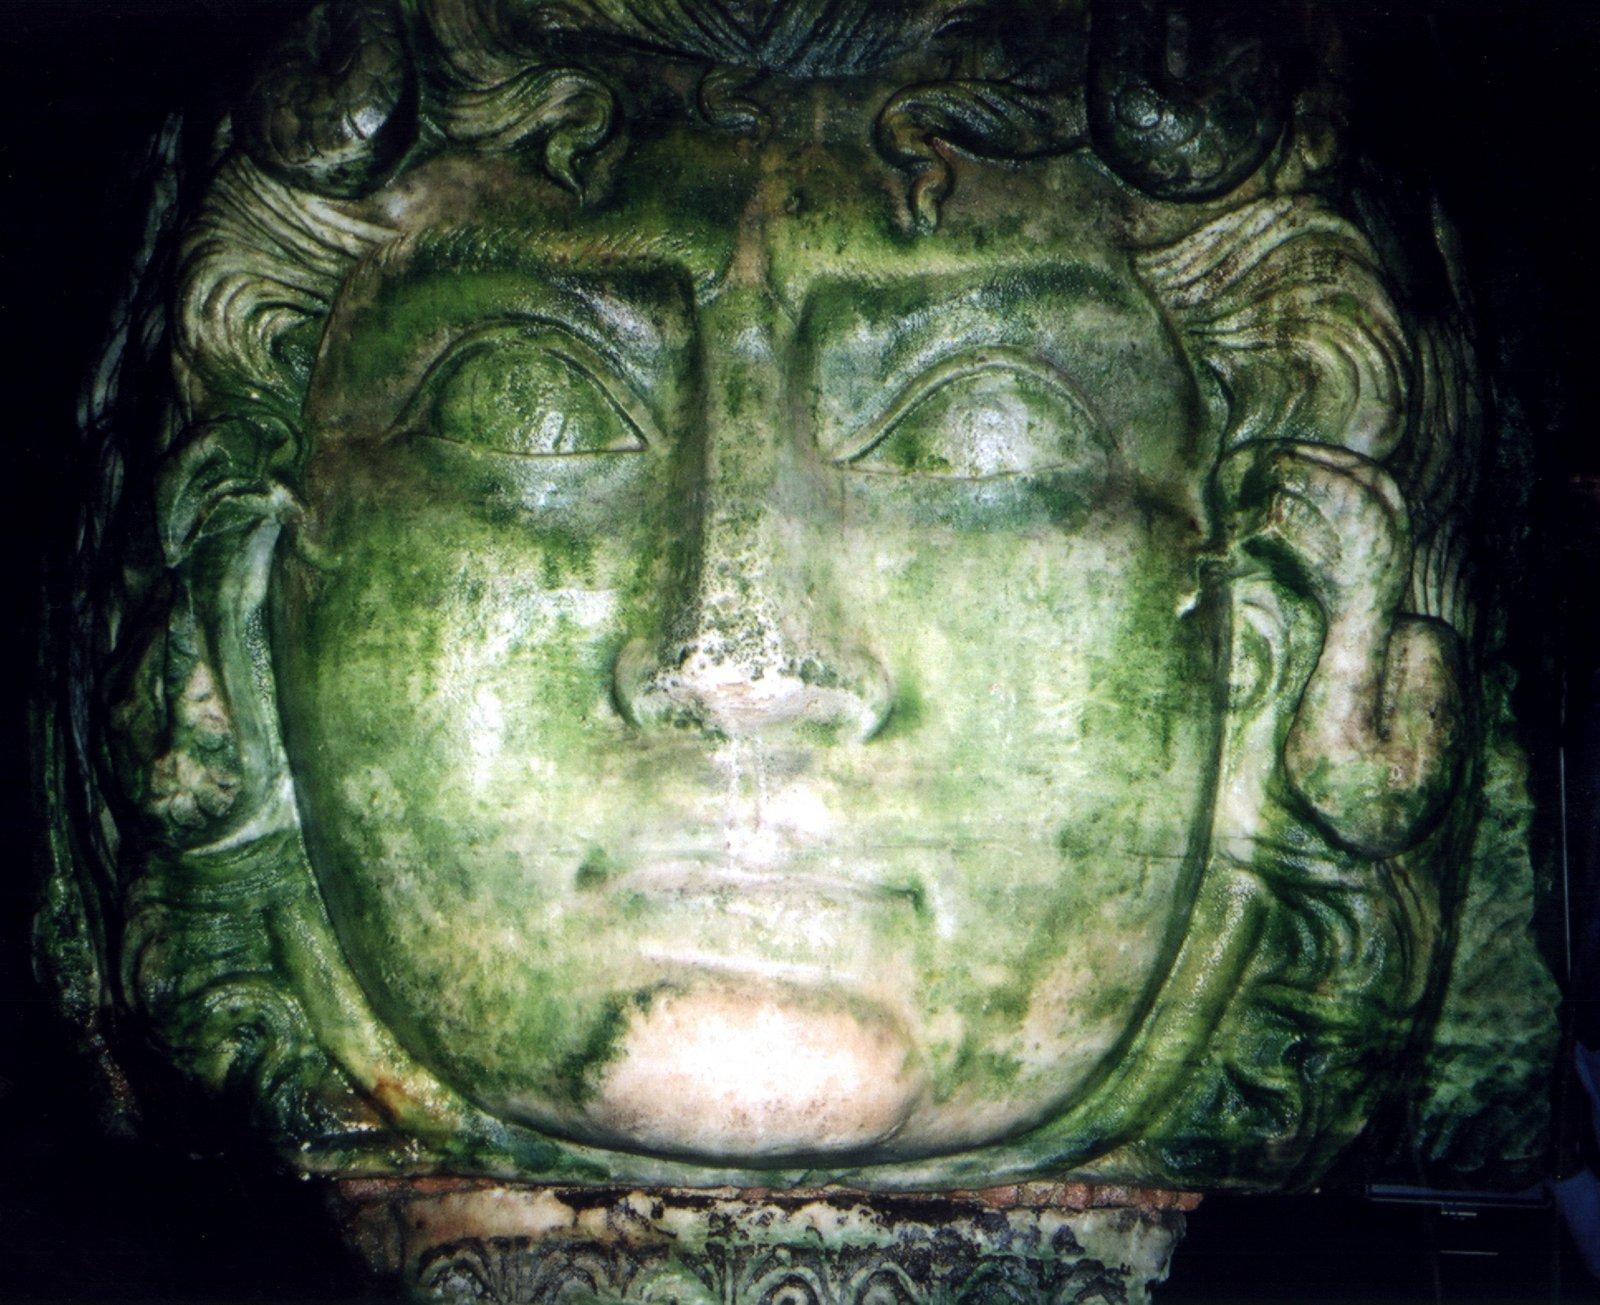 medusa-3-yerebatan-sarnici-basilica-cistern-bazilika